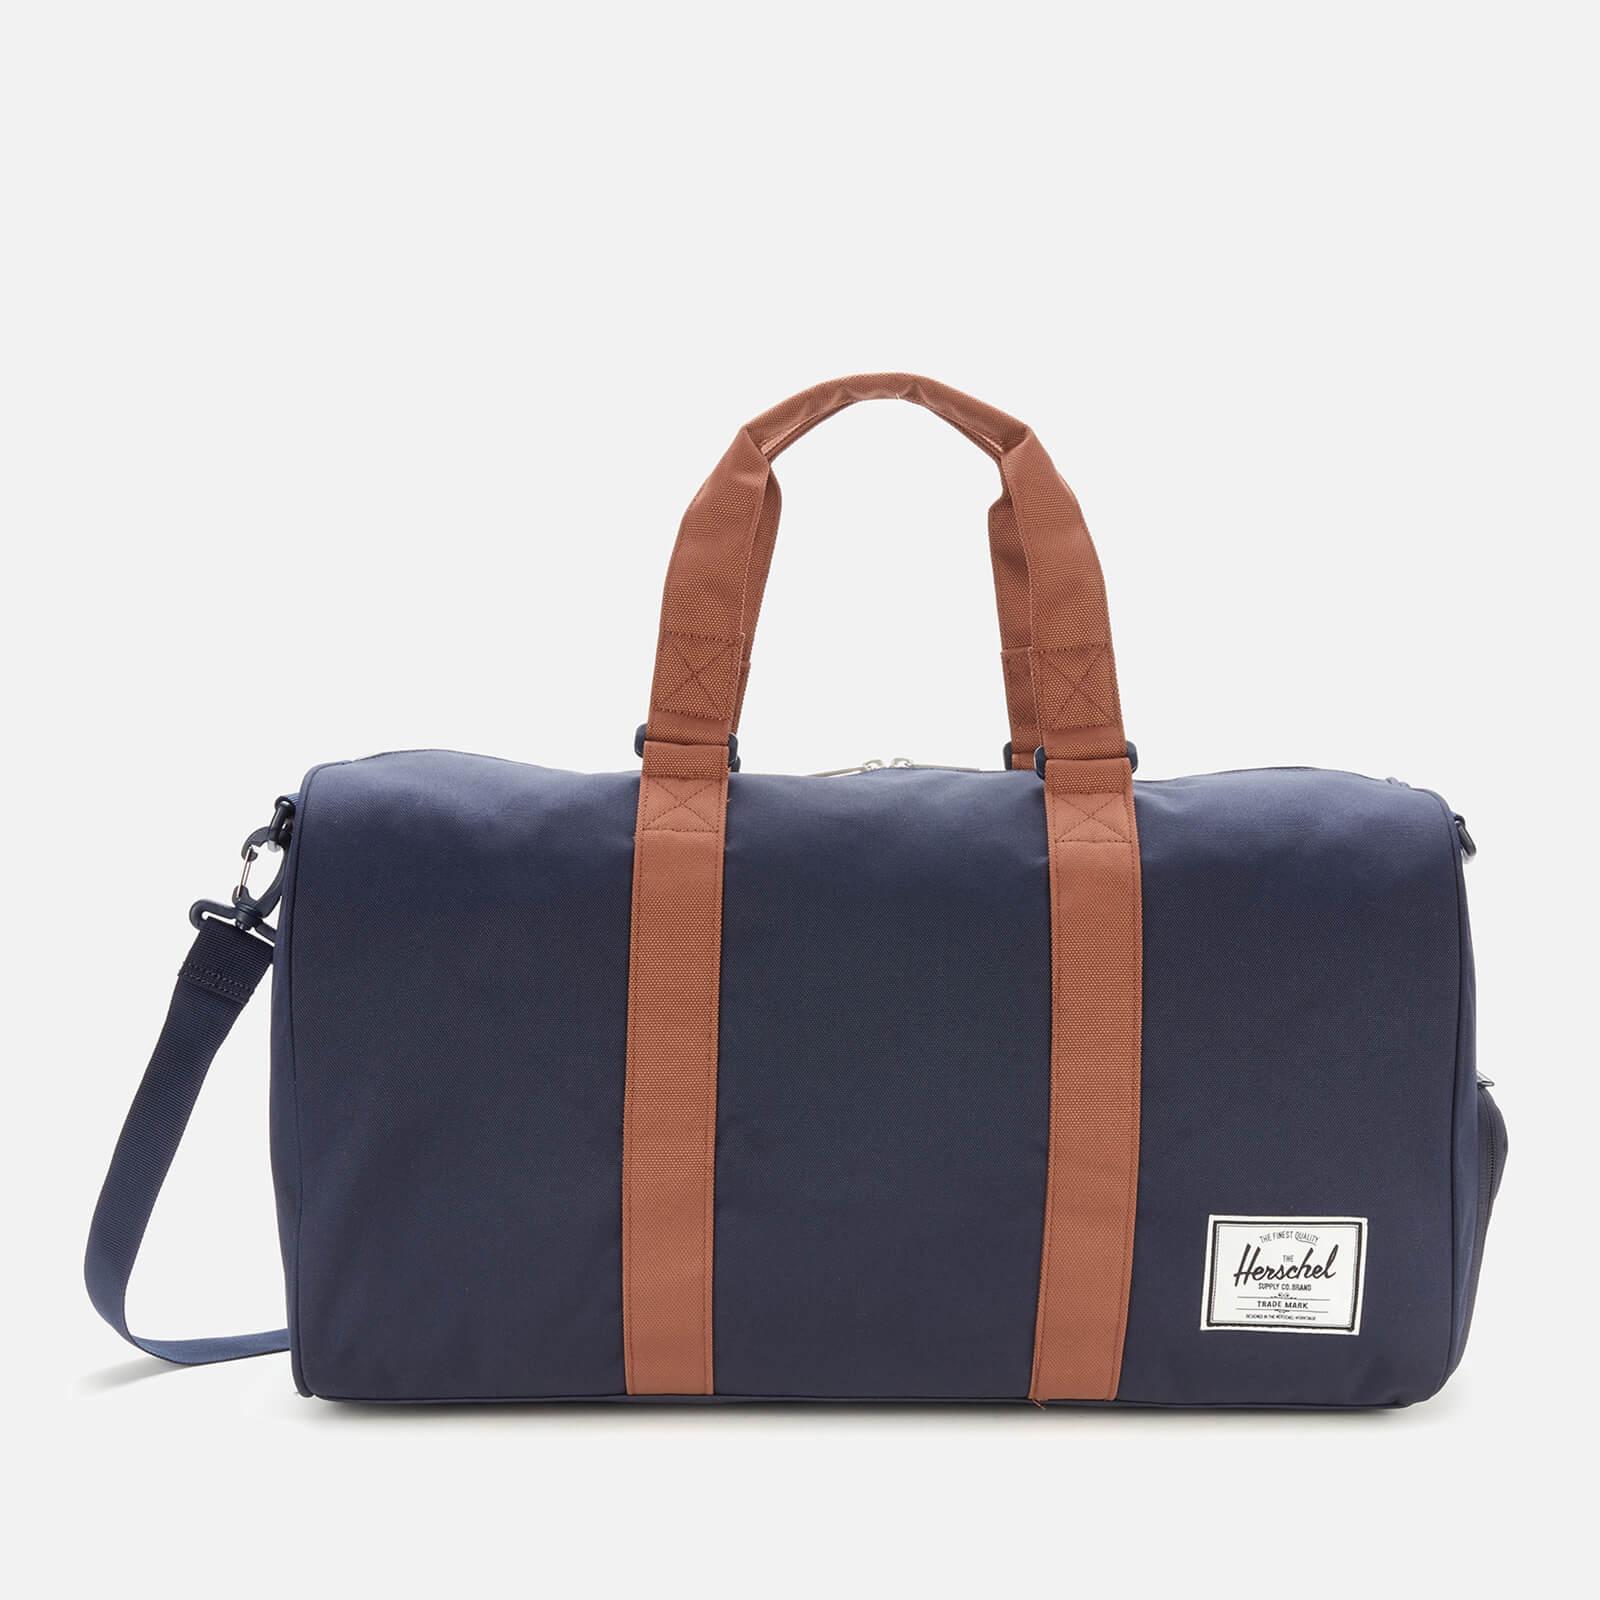 Herschel Supply Co. Men's Novel Duffle Bag - Peacoat/Saddle Brown